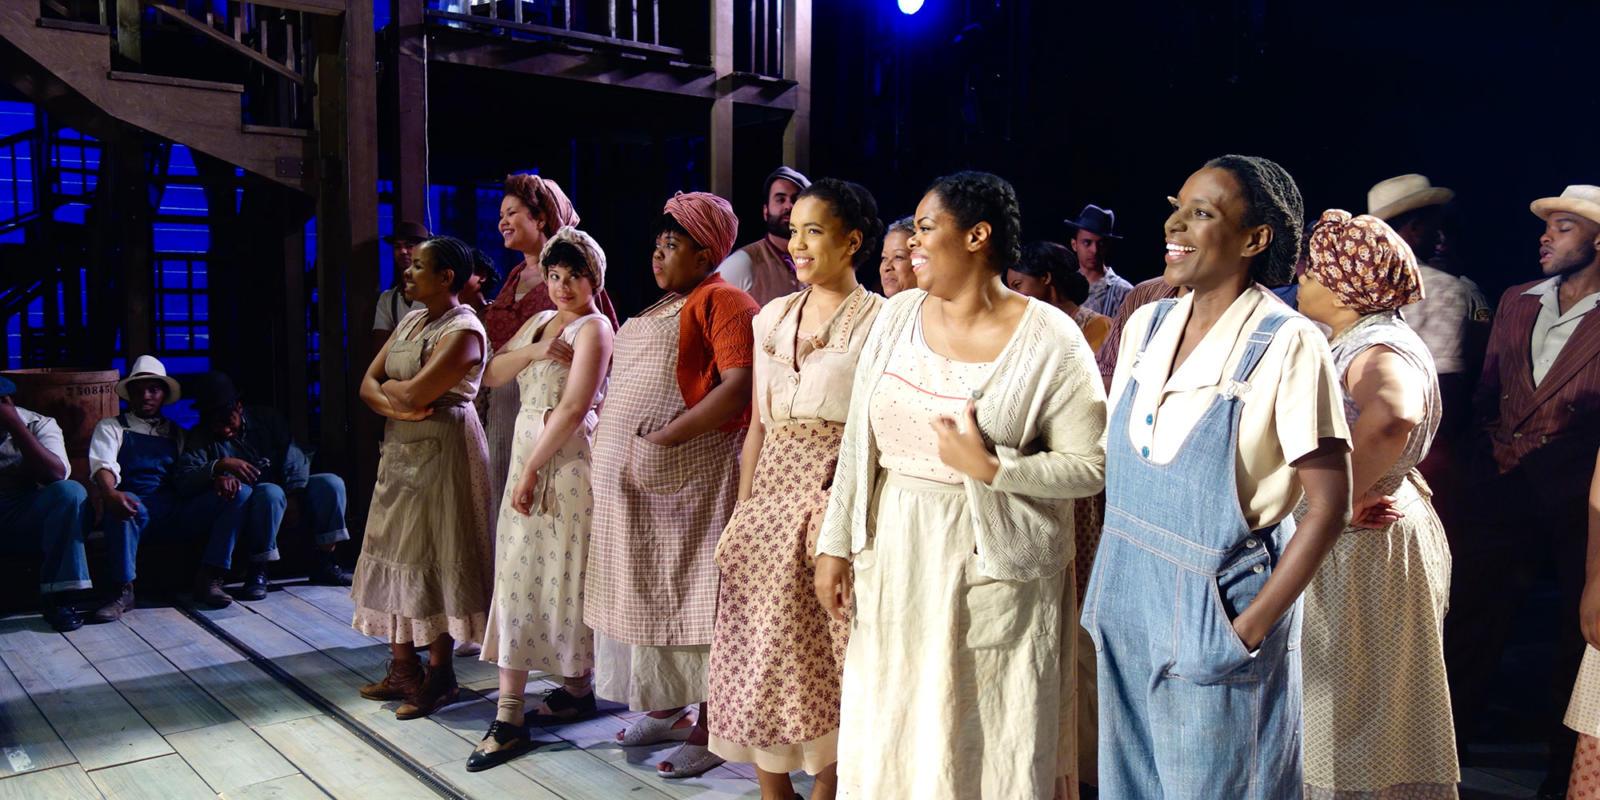 ENO Porgy and Bess: Nozuko Teto (Strawberry Woman), Simone Ibbett-Brown, Isabelle Peters, Fikile Mthethwa, Rachel Oyawale, Sarah-Jane Lewis (Annie) and Jordene Thomas on stage after the show